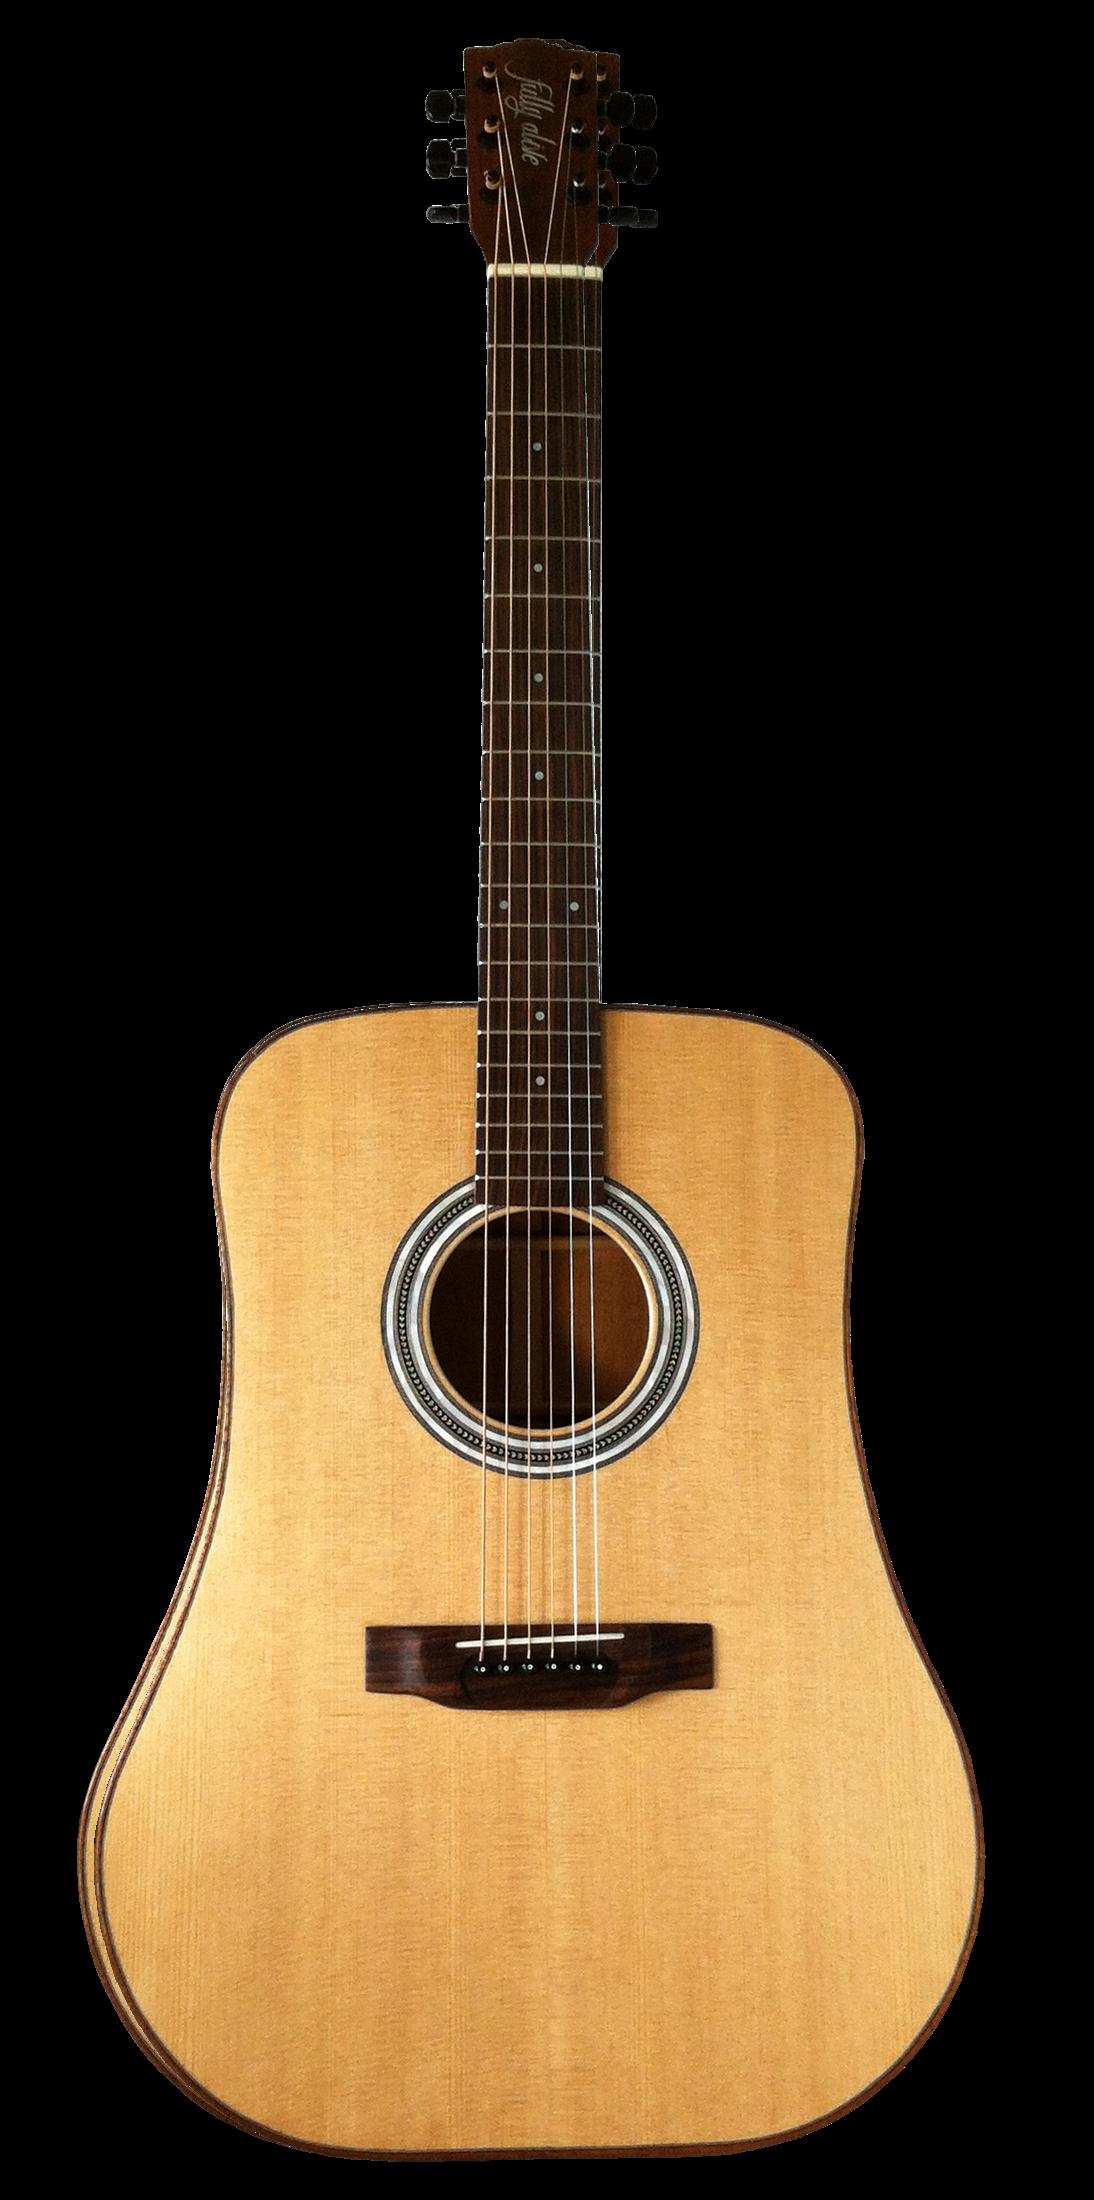 building an acoustic steel string guitar details on how i built my first acoustic guitar. Black Bedroom Furniture Sets. Home Design Ideas